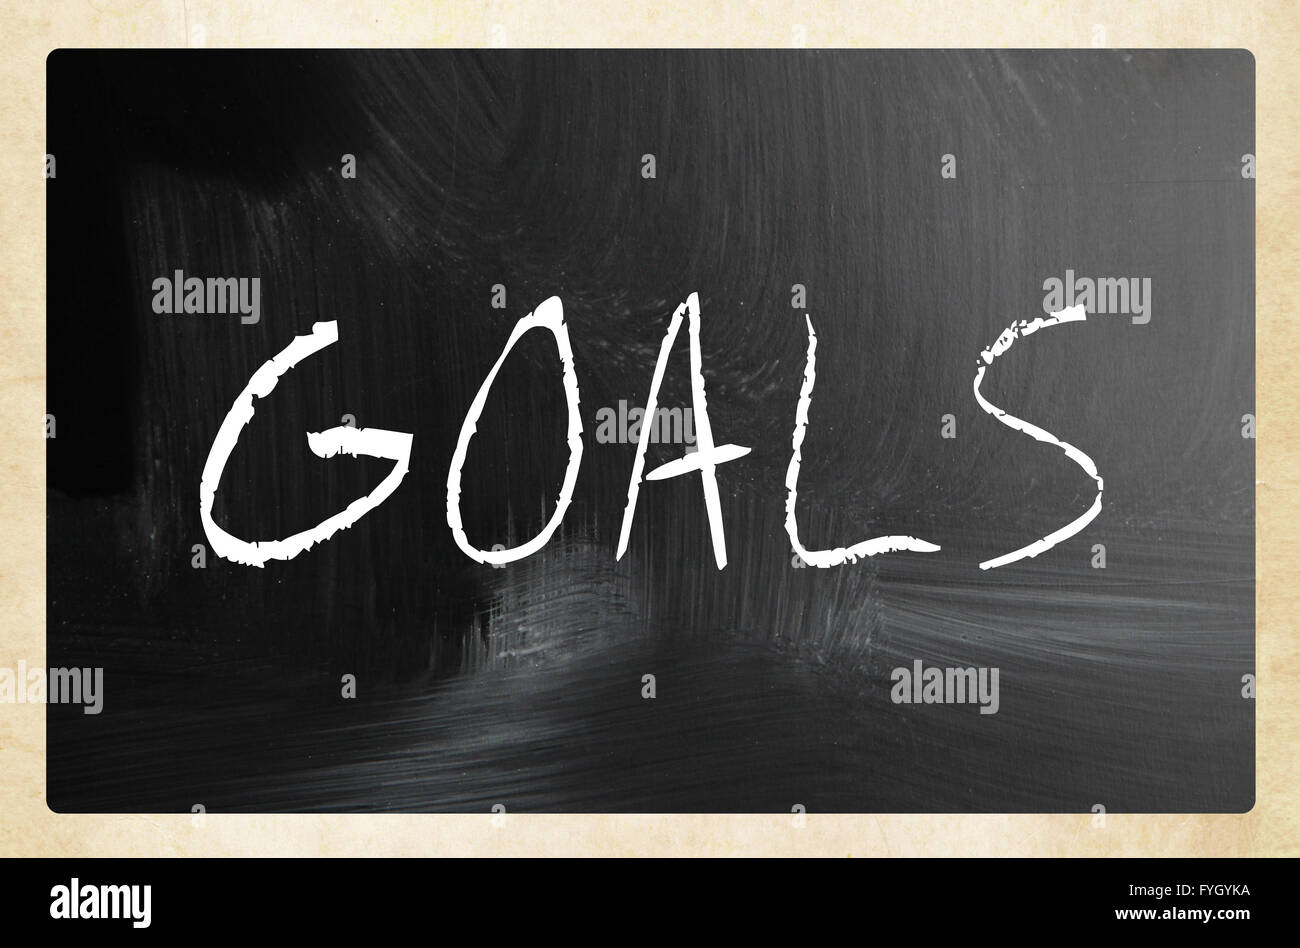 Goals handwritten with white chalk on a blackboard - Stock Image